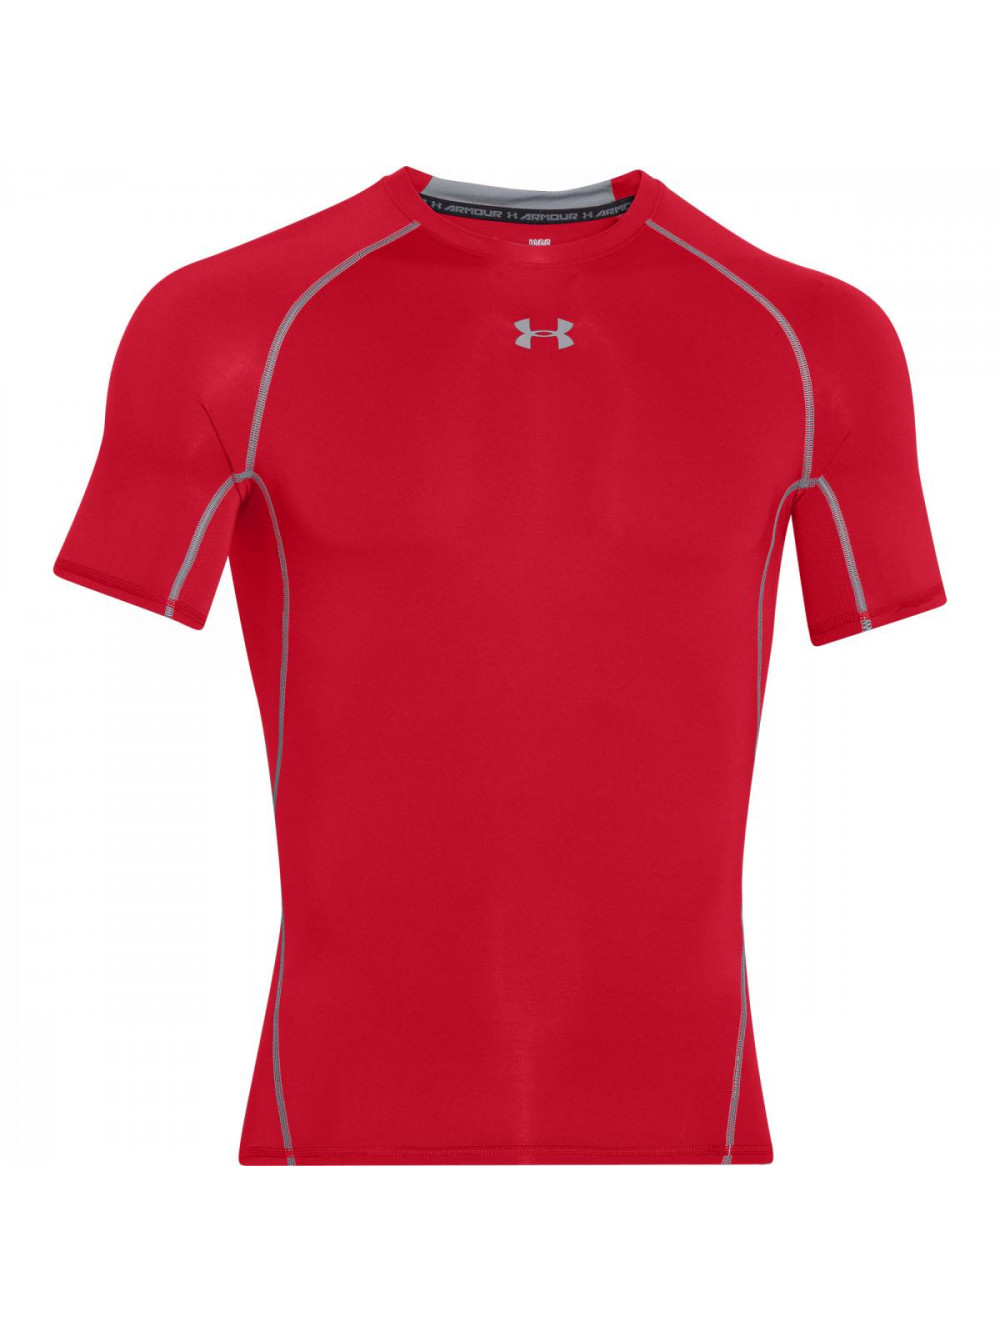 Pánske kompresné tričko Under Armour HeatGear Short Sleeve červené